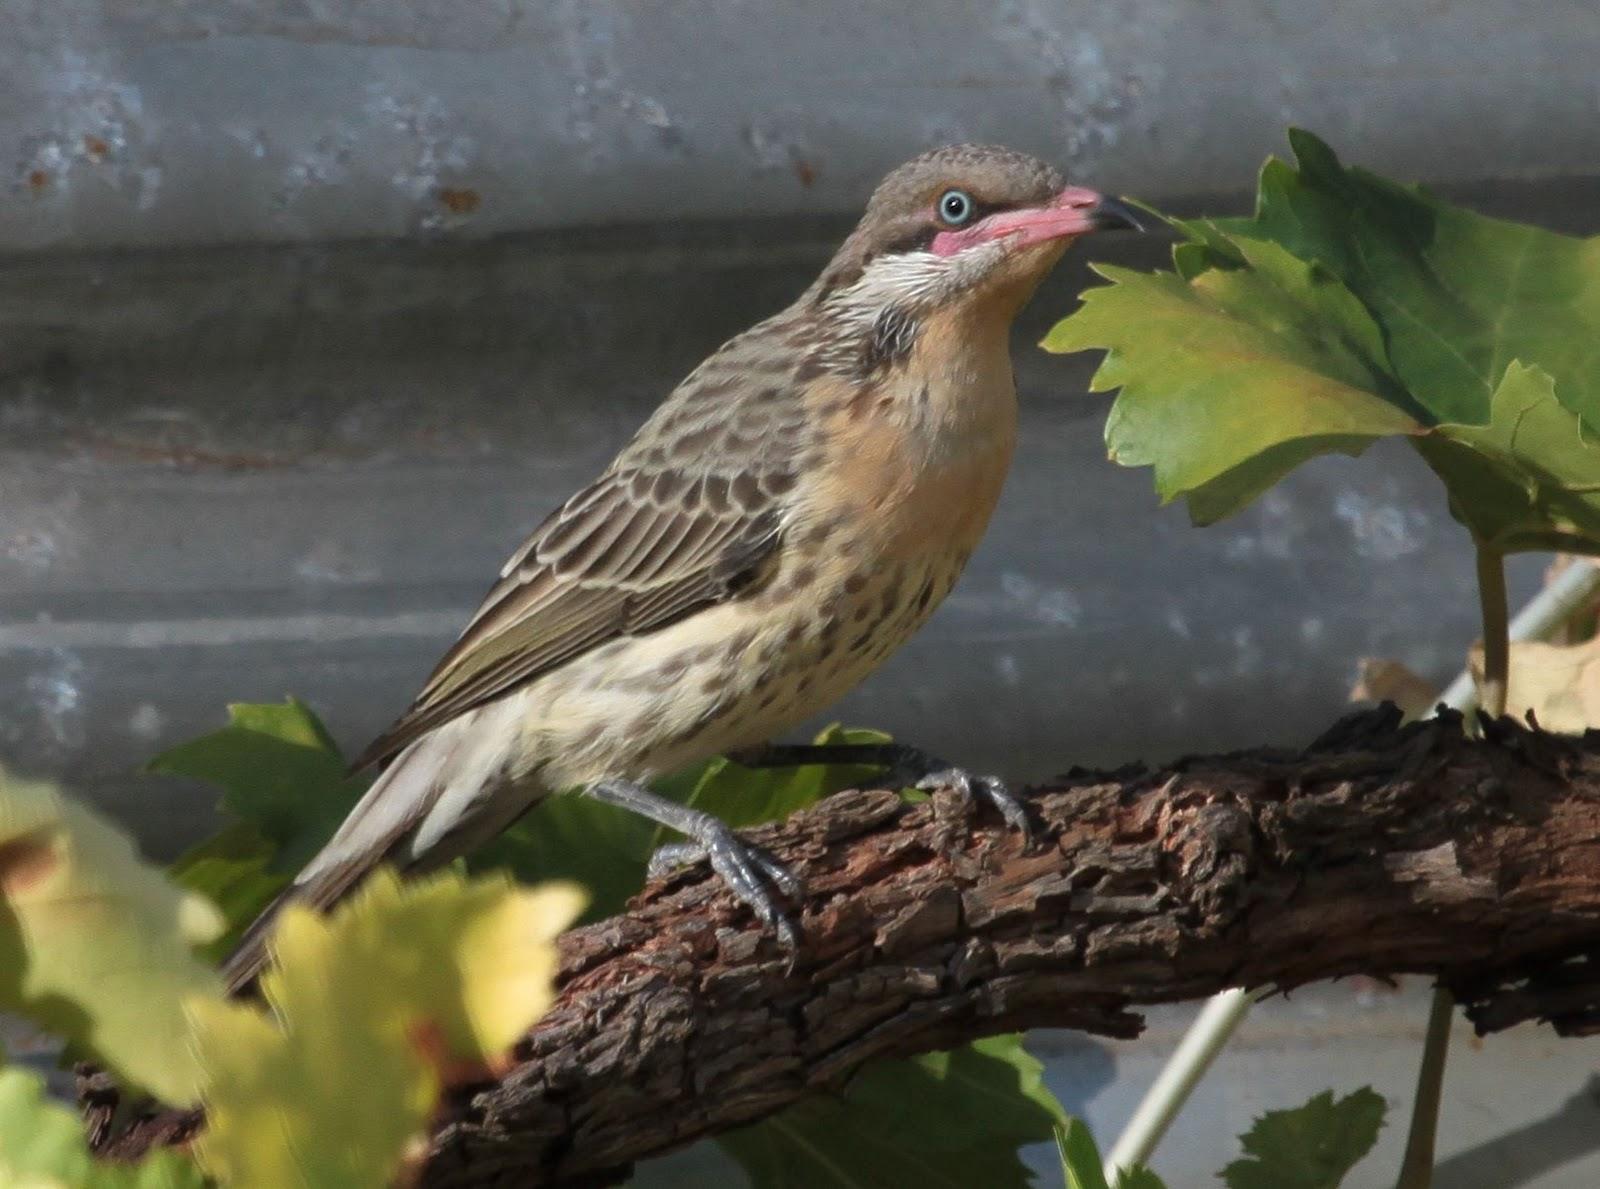 Richard Waring's Birds of Australia: Photos of Birds in ...